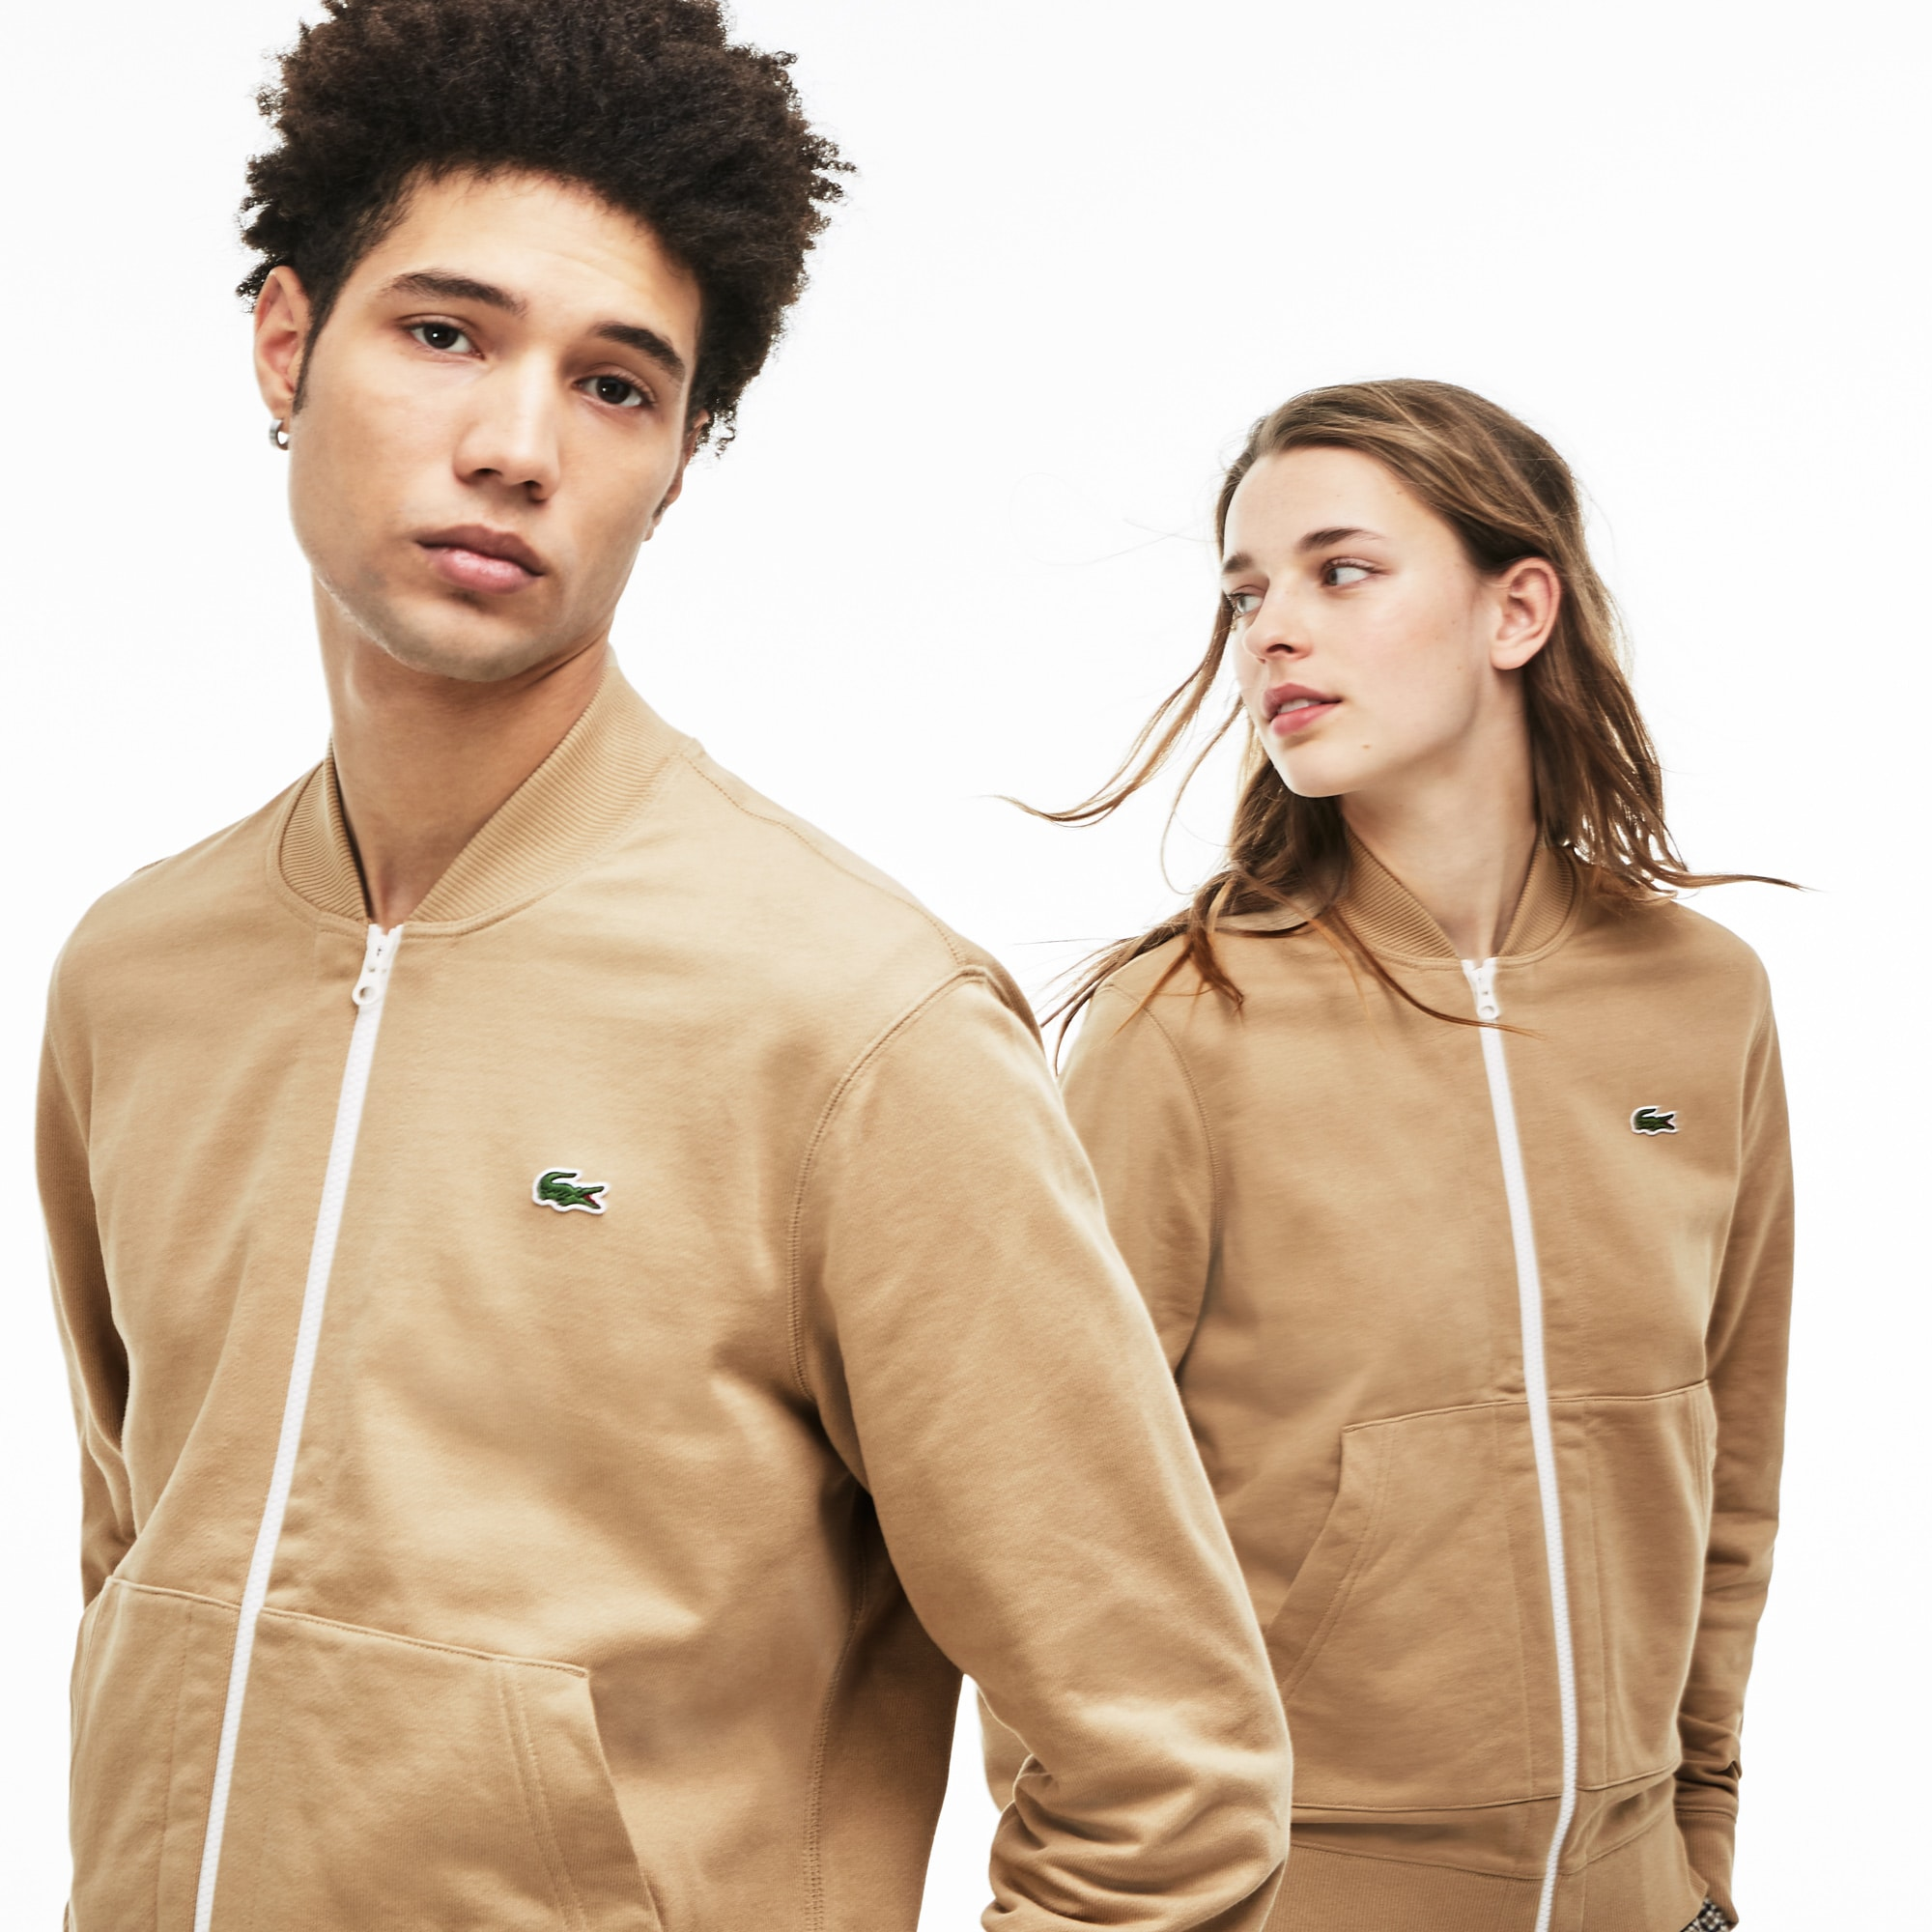 Unisex-Sweatshirt aus Fleece mit Teddy-Kragen LACOSTE L!VE